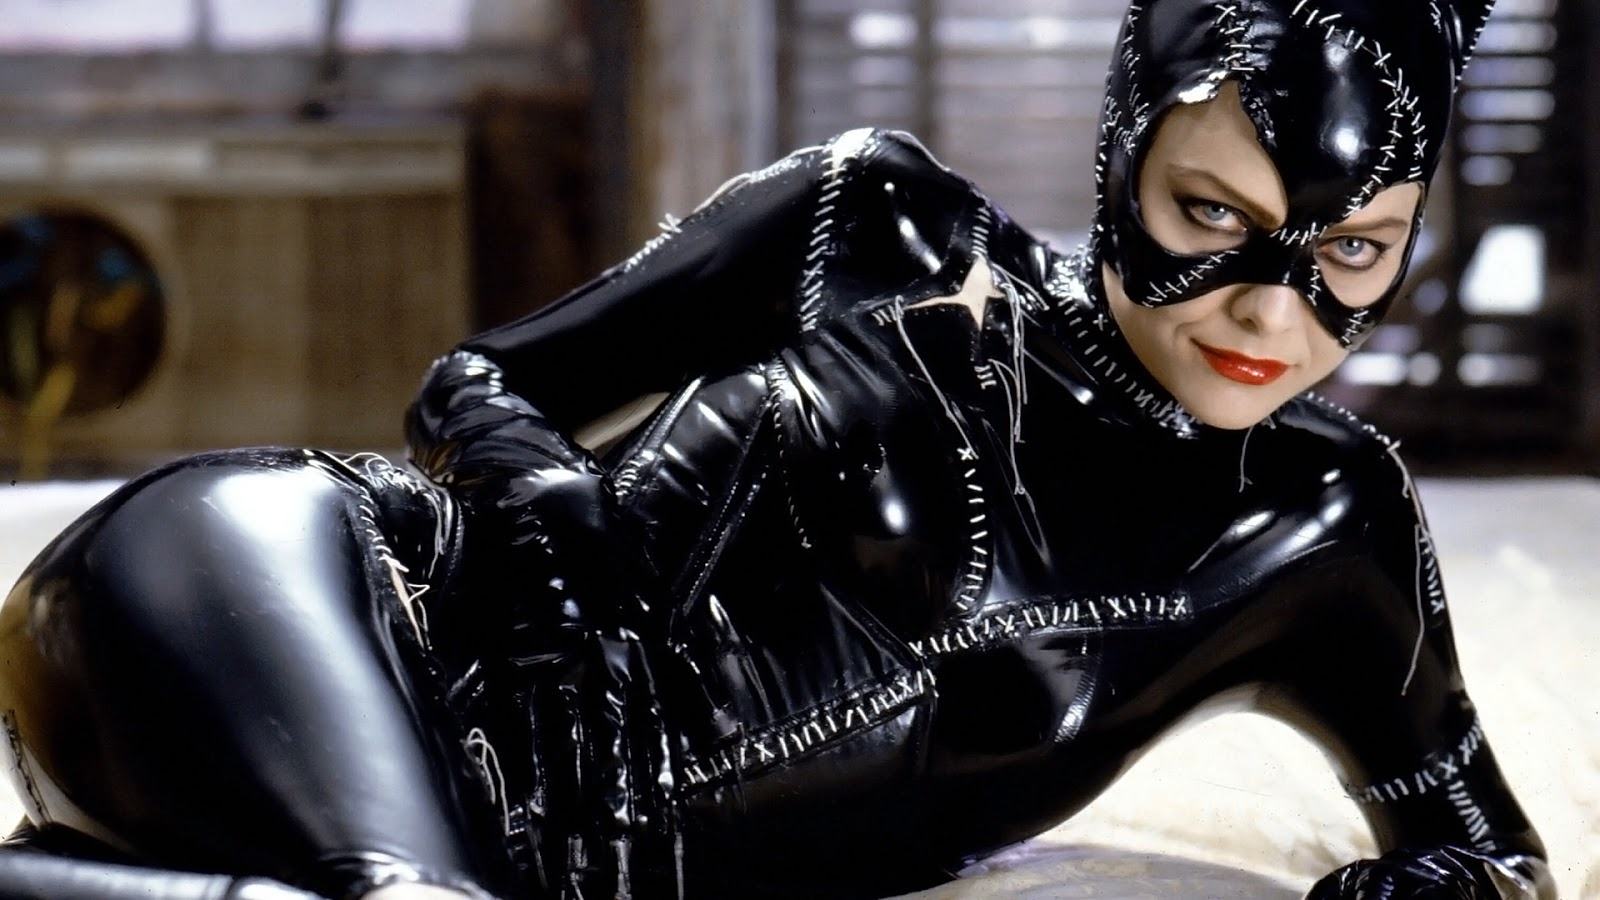 http://3.bp.blogspot.com/-Gn2I_Dhe_j4/UITLFORtRlI/AAAAAAAAEWQ/n-mFELFaTGM/s1600/michelle-pfeiffer-cat-women.jpg